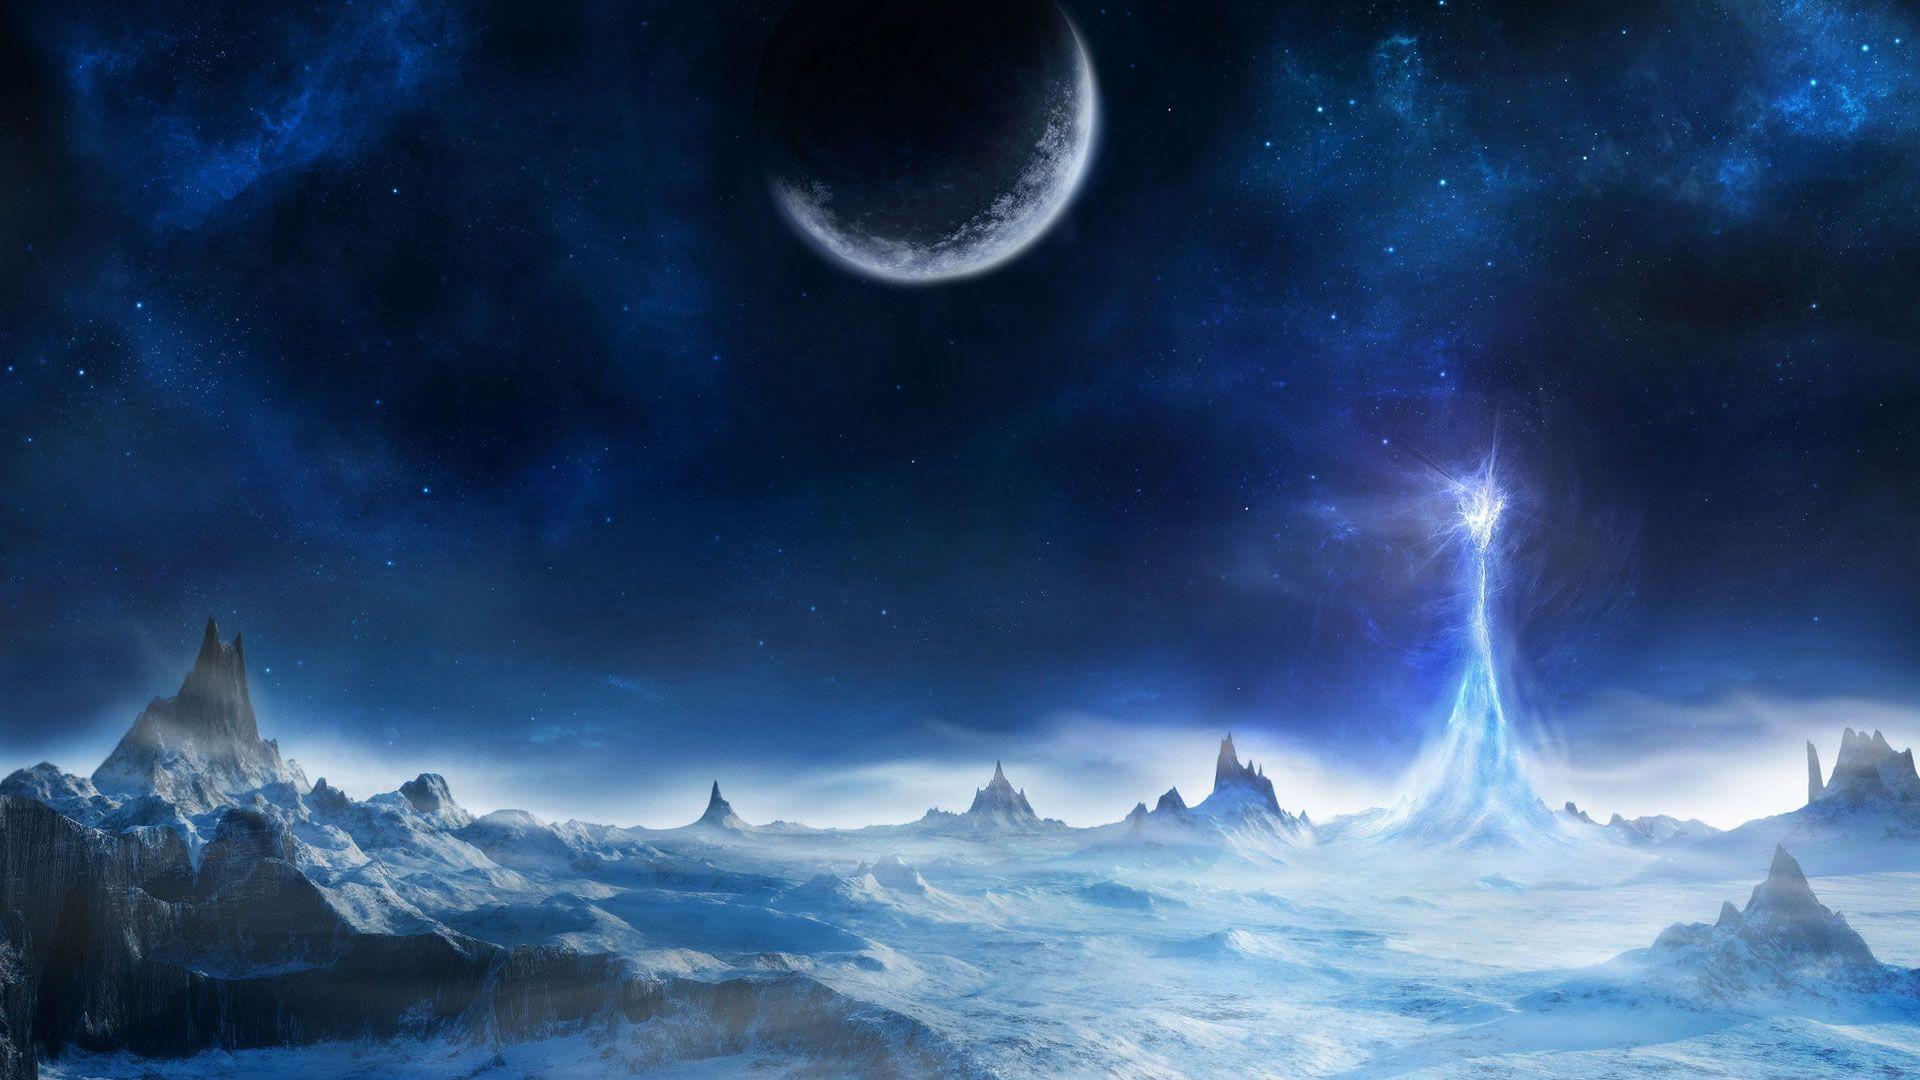 Fantasy Desktop Backgrounds 15441 Hd Wallpapers Site Fantasticheskij Mir Hudozhestvennoe Prostranstvo Fentezi